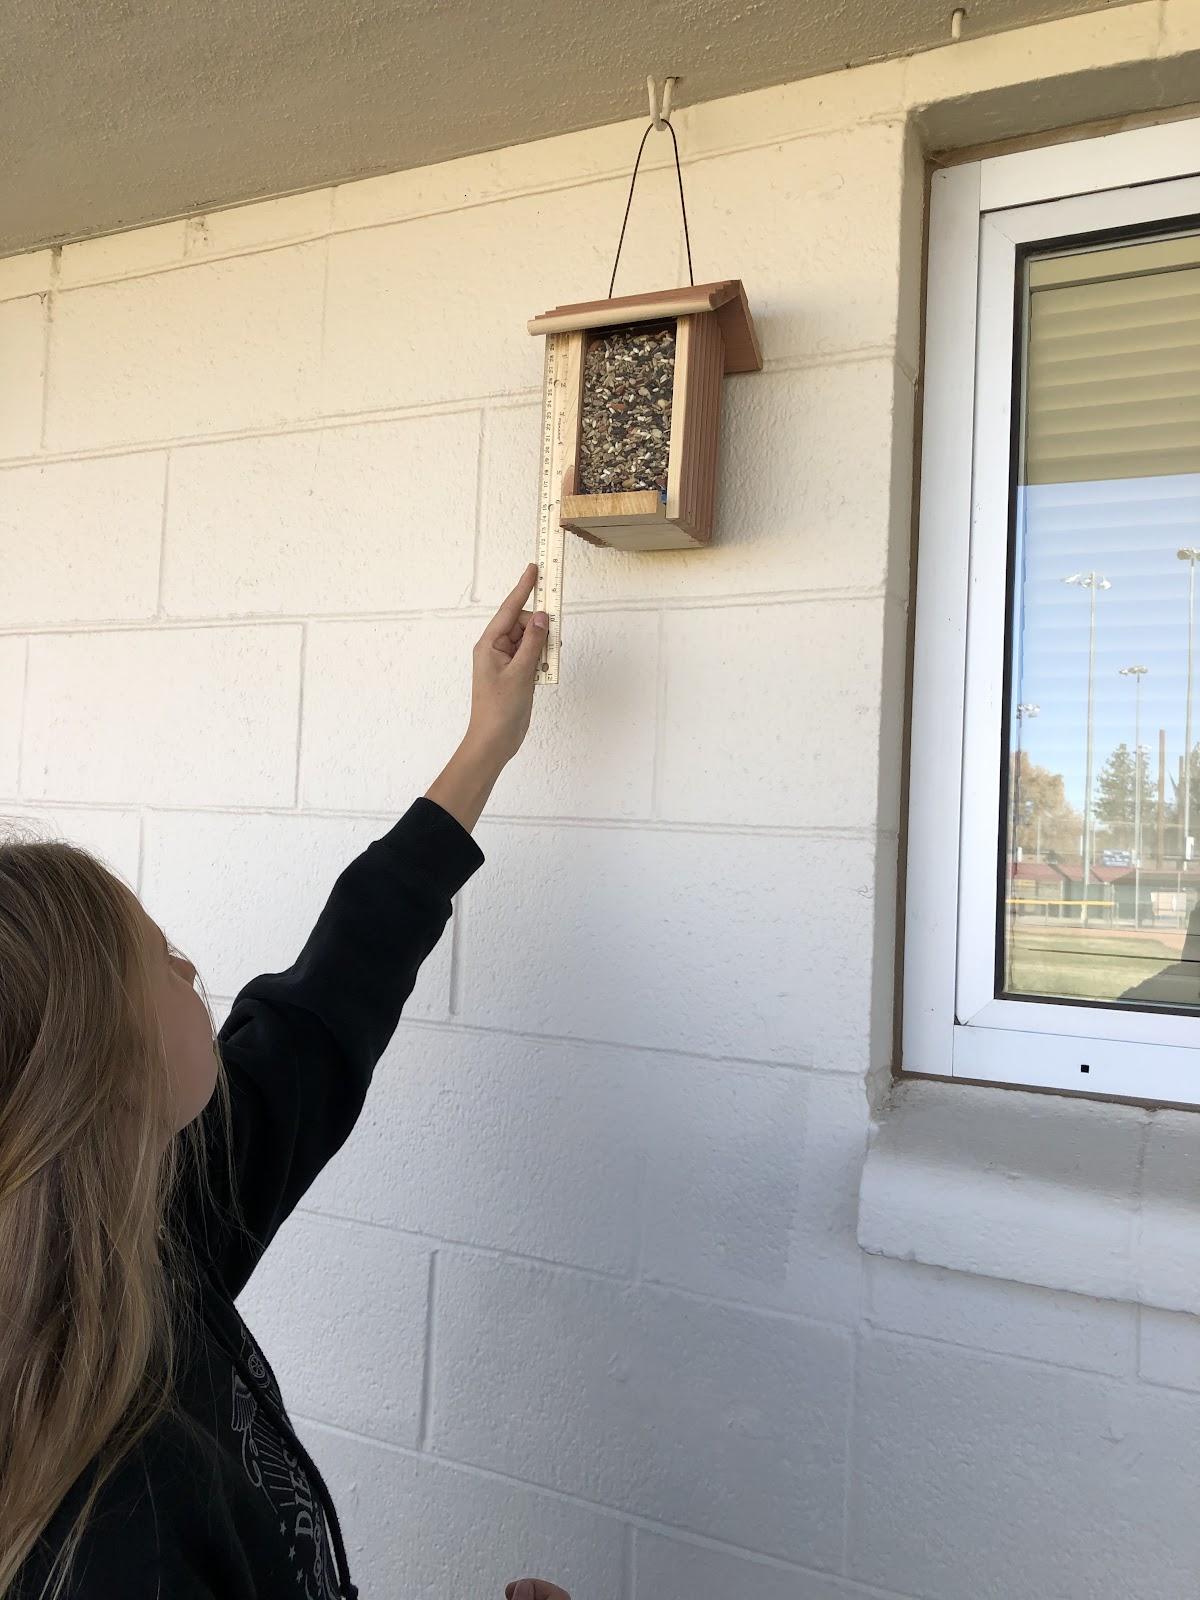 SWOPE Students Work With Bird Feeders